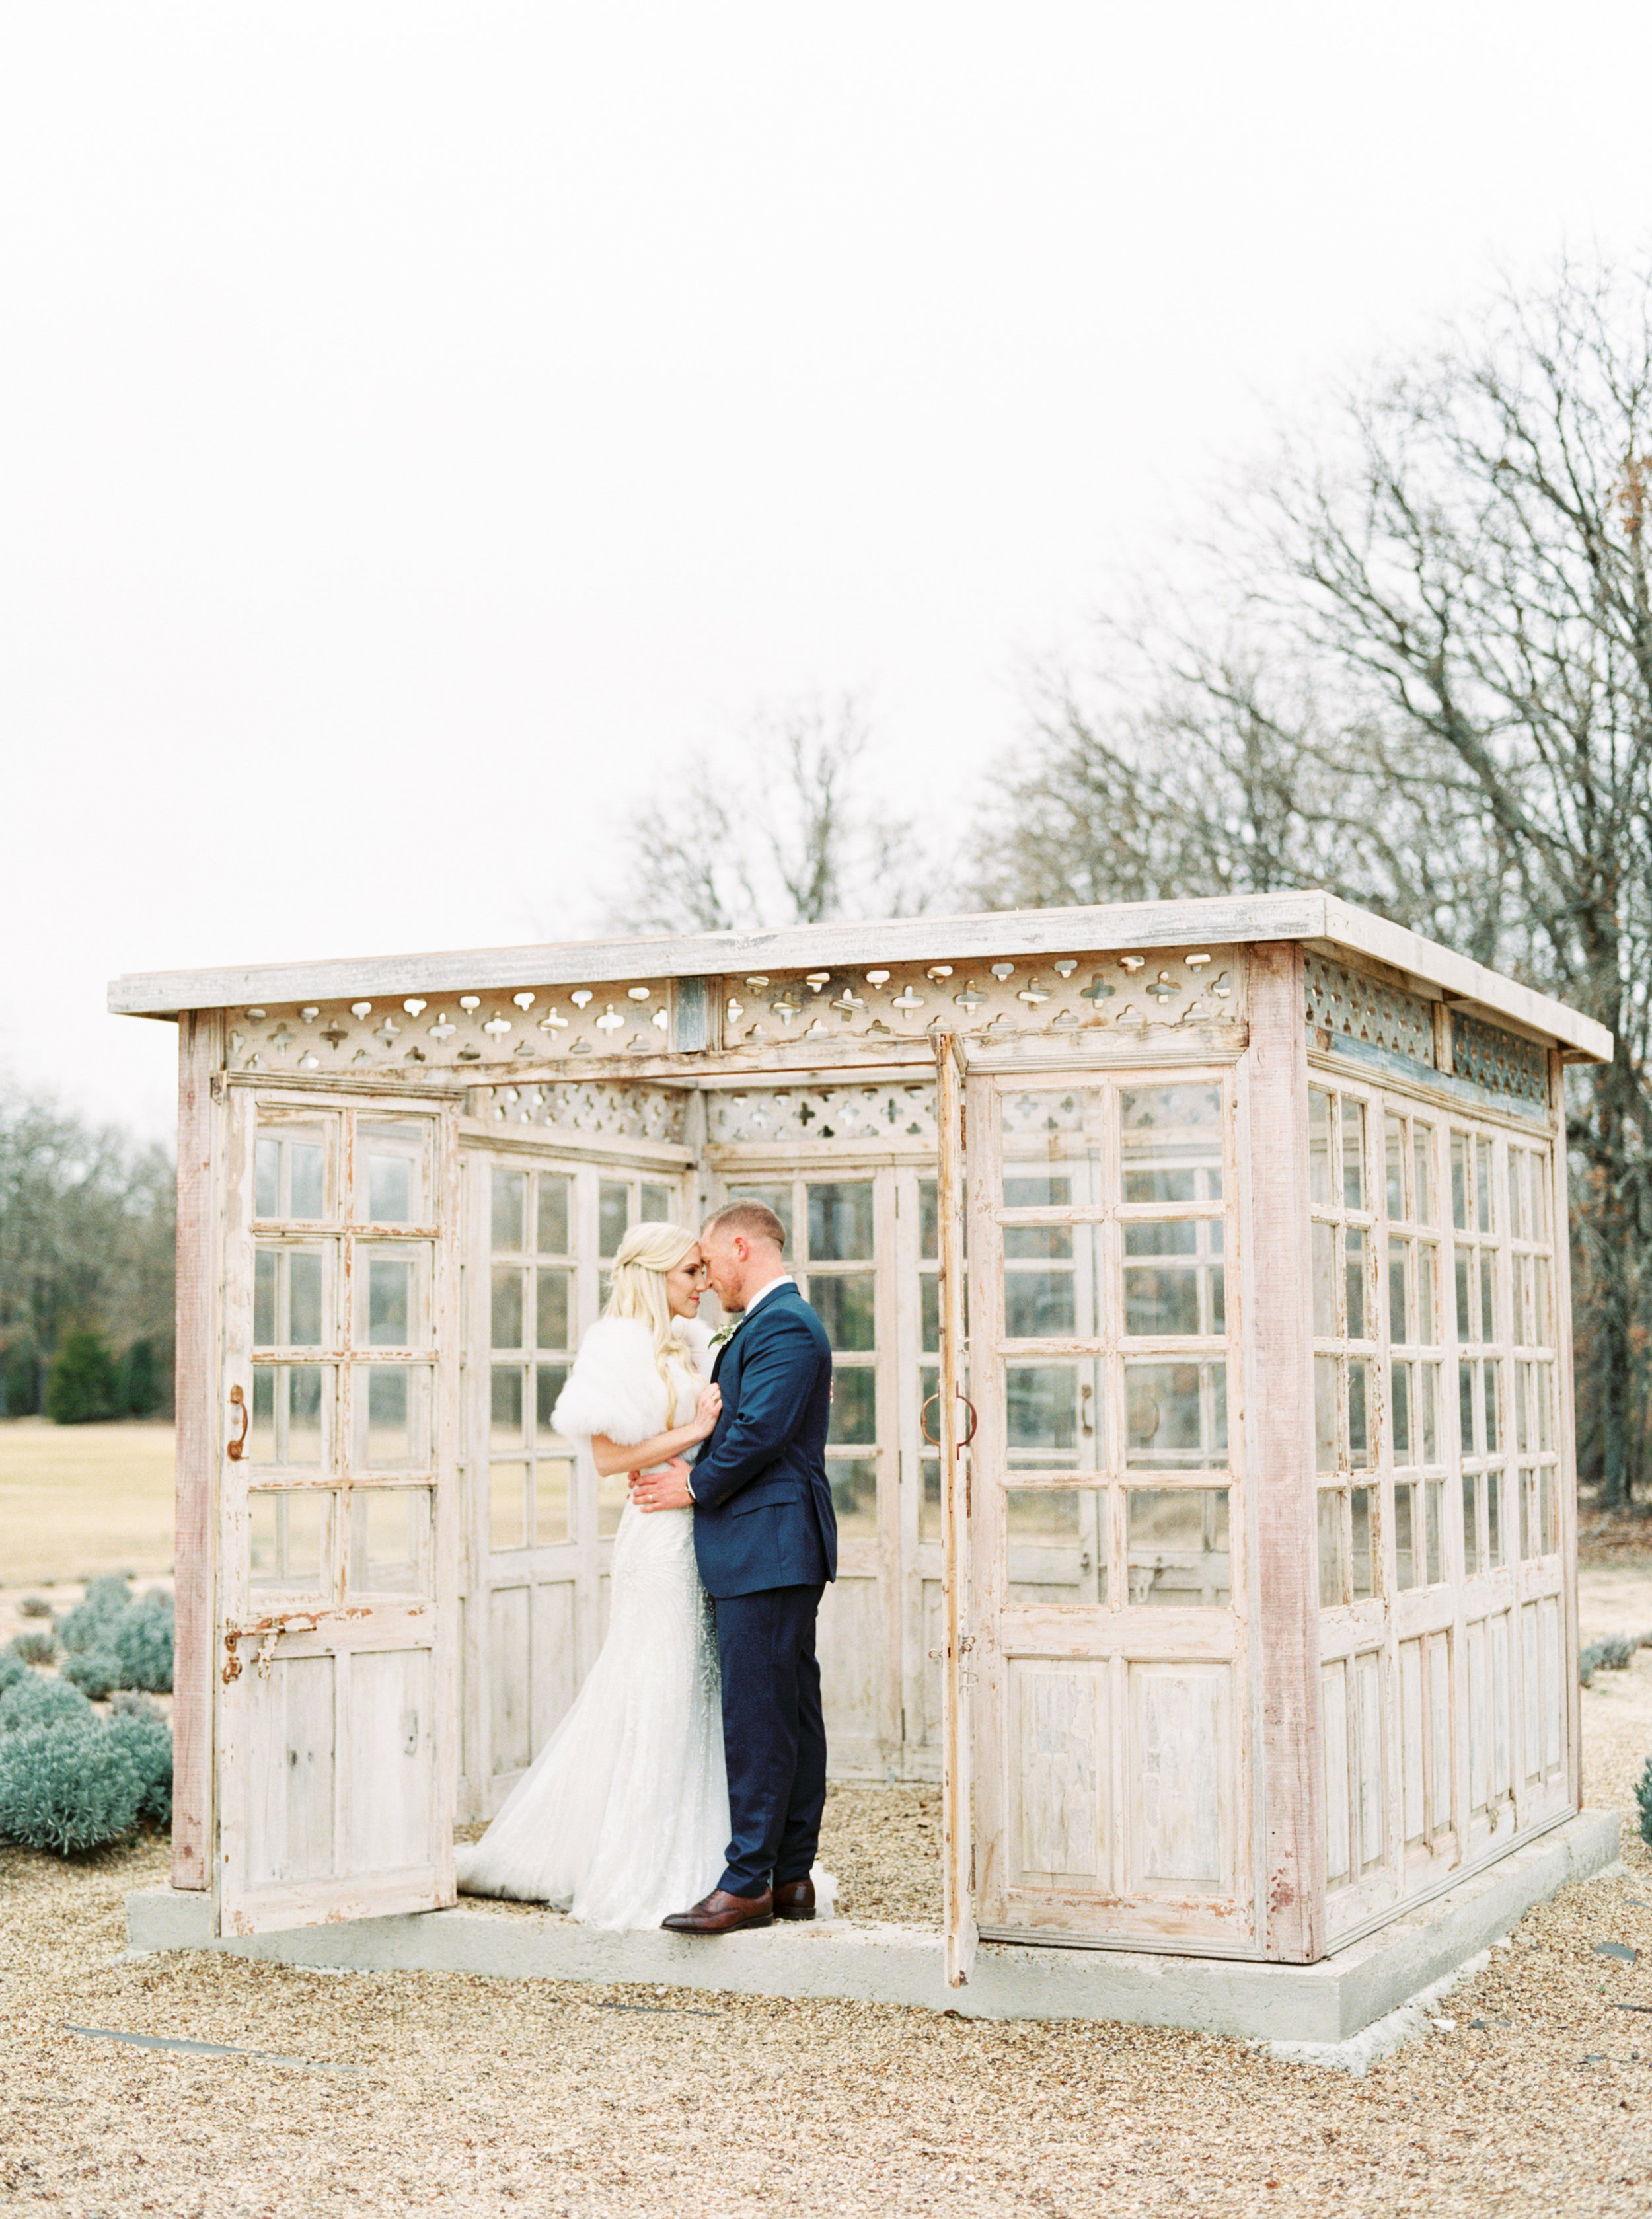 Chloe+Austin Wedding_670.JPG